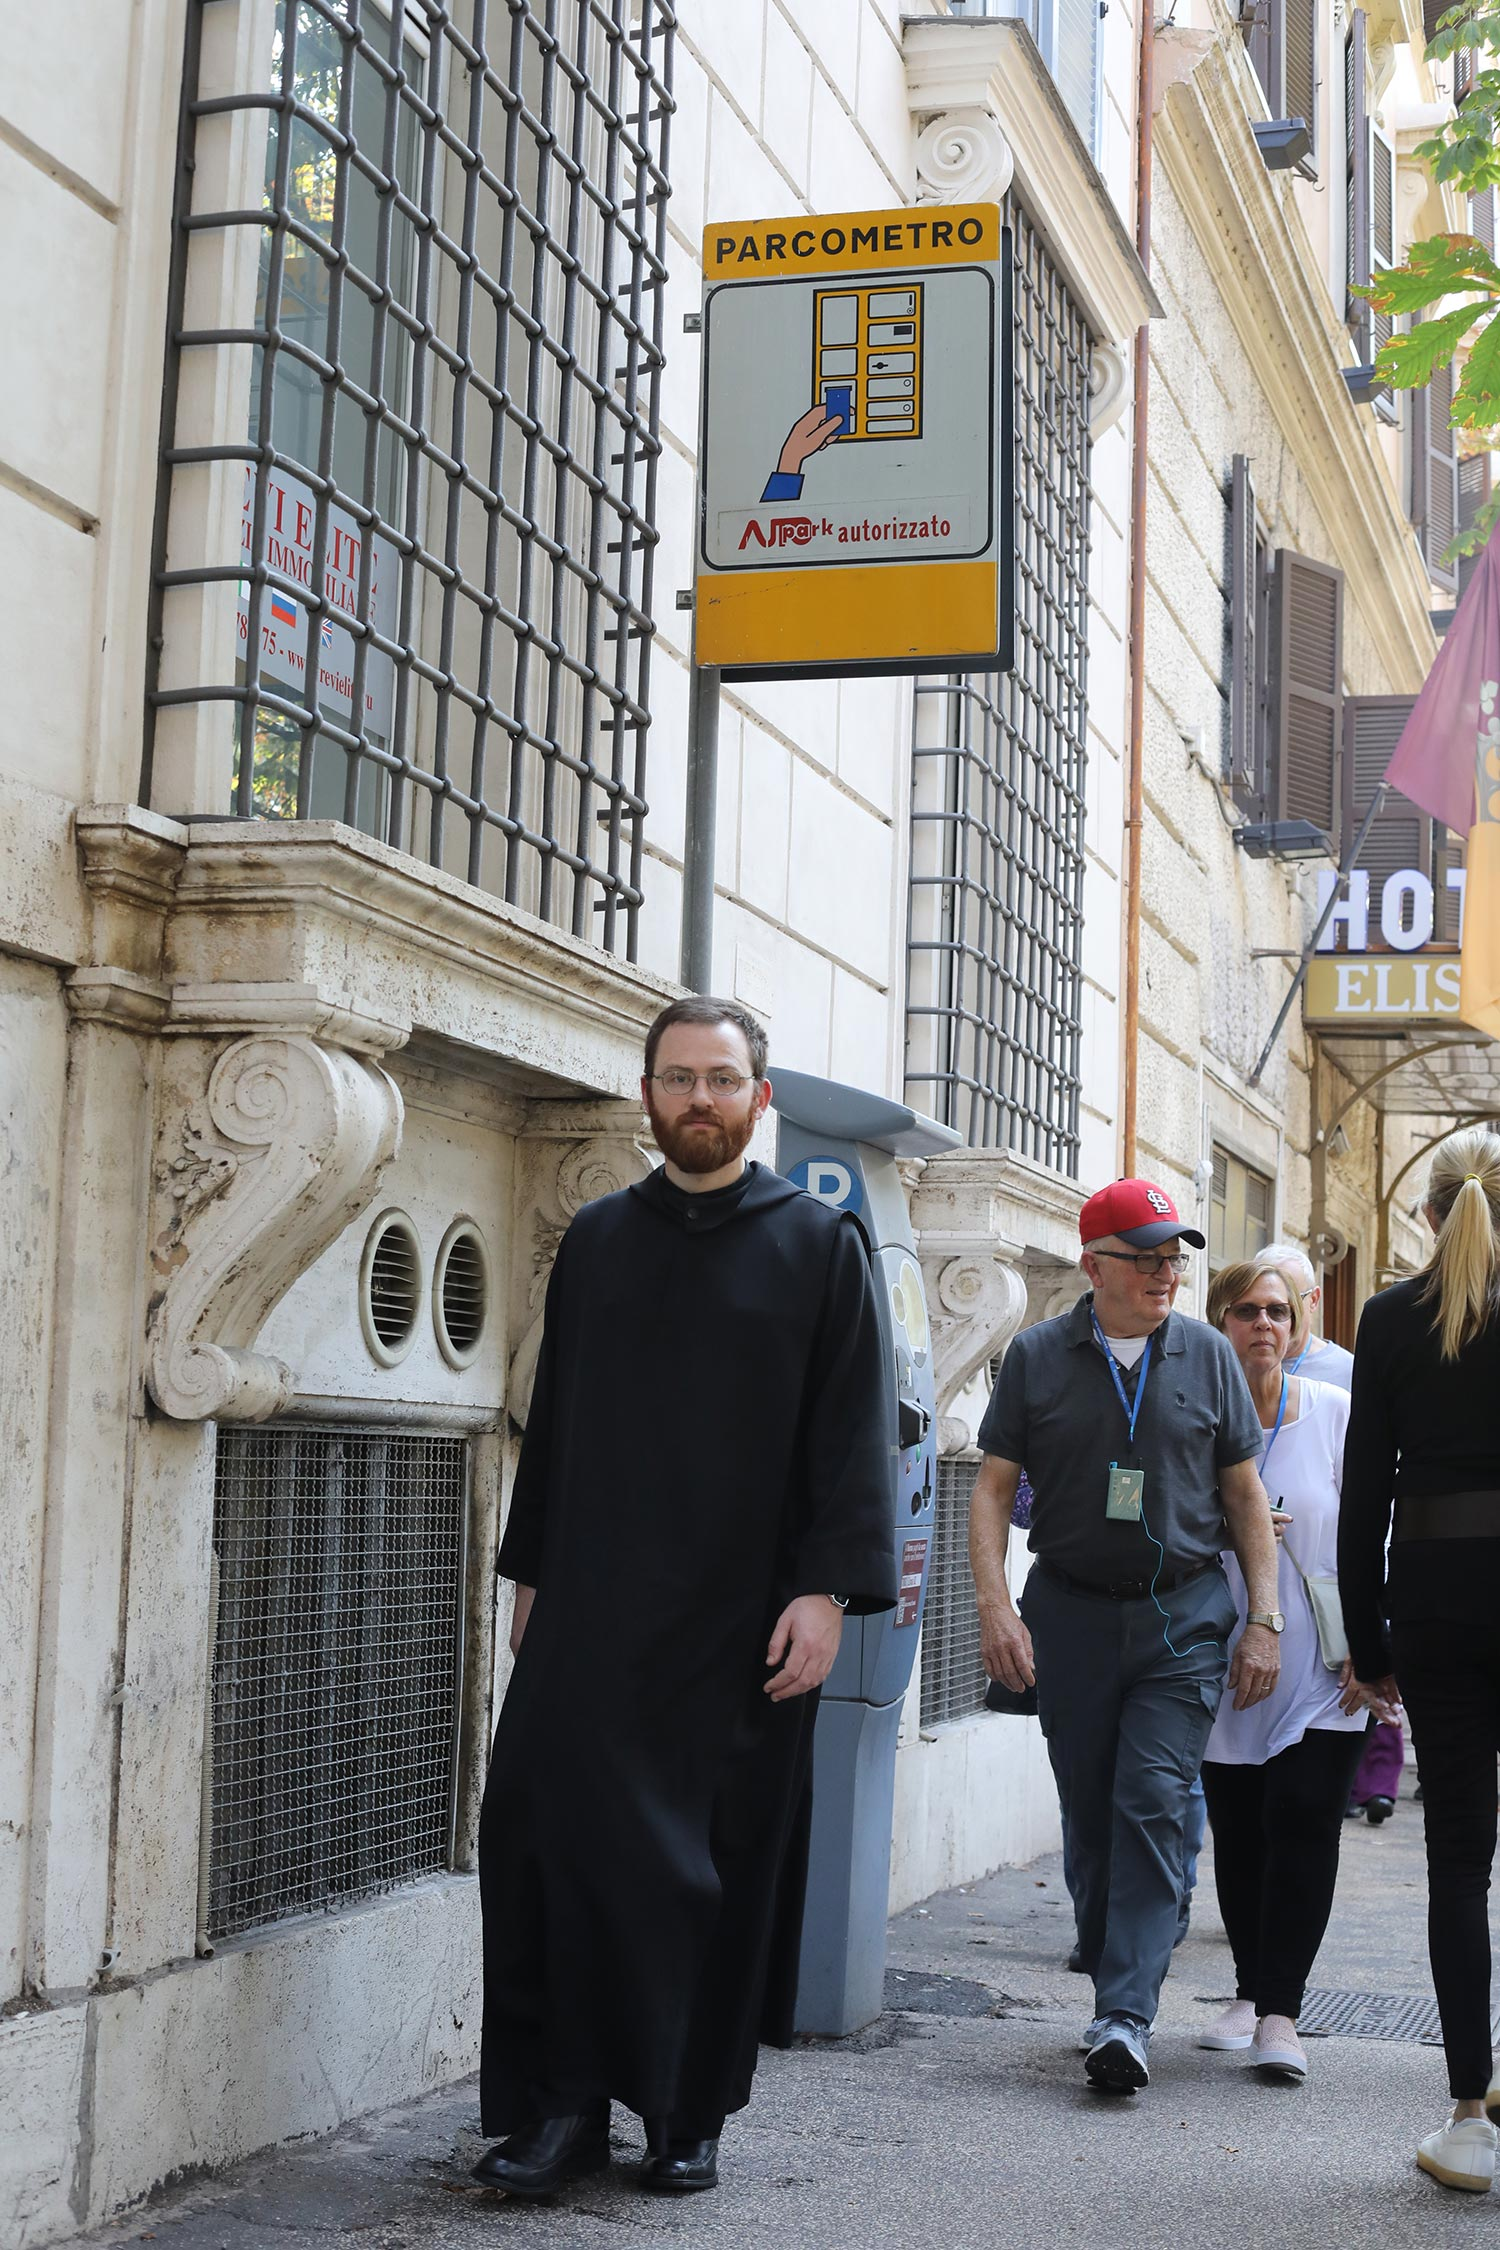 Pilgrimage_Rome_3028_D1.jpg